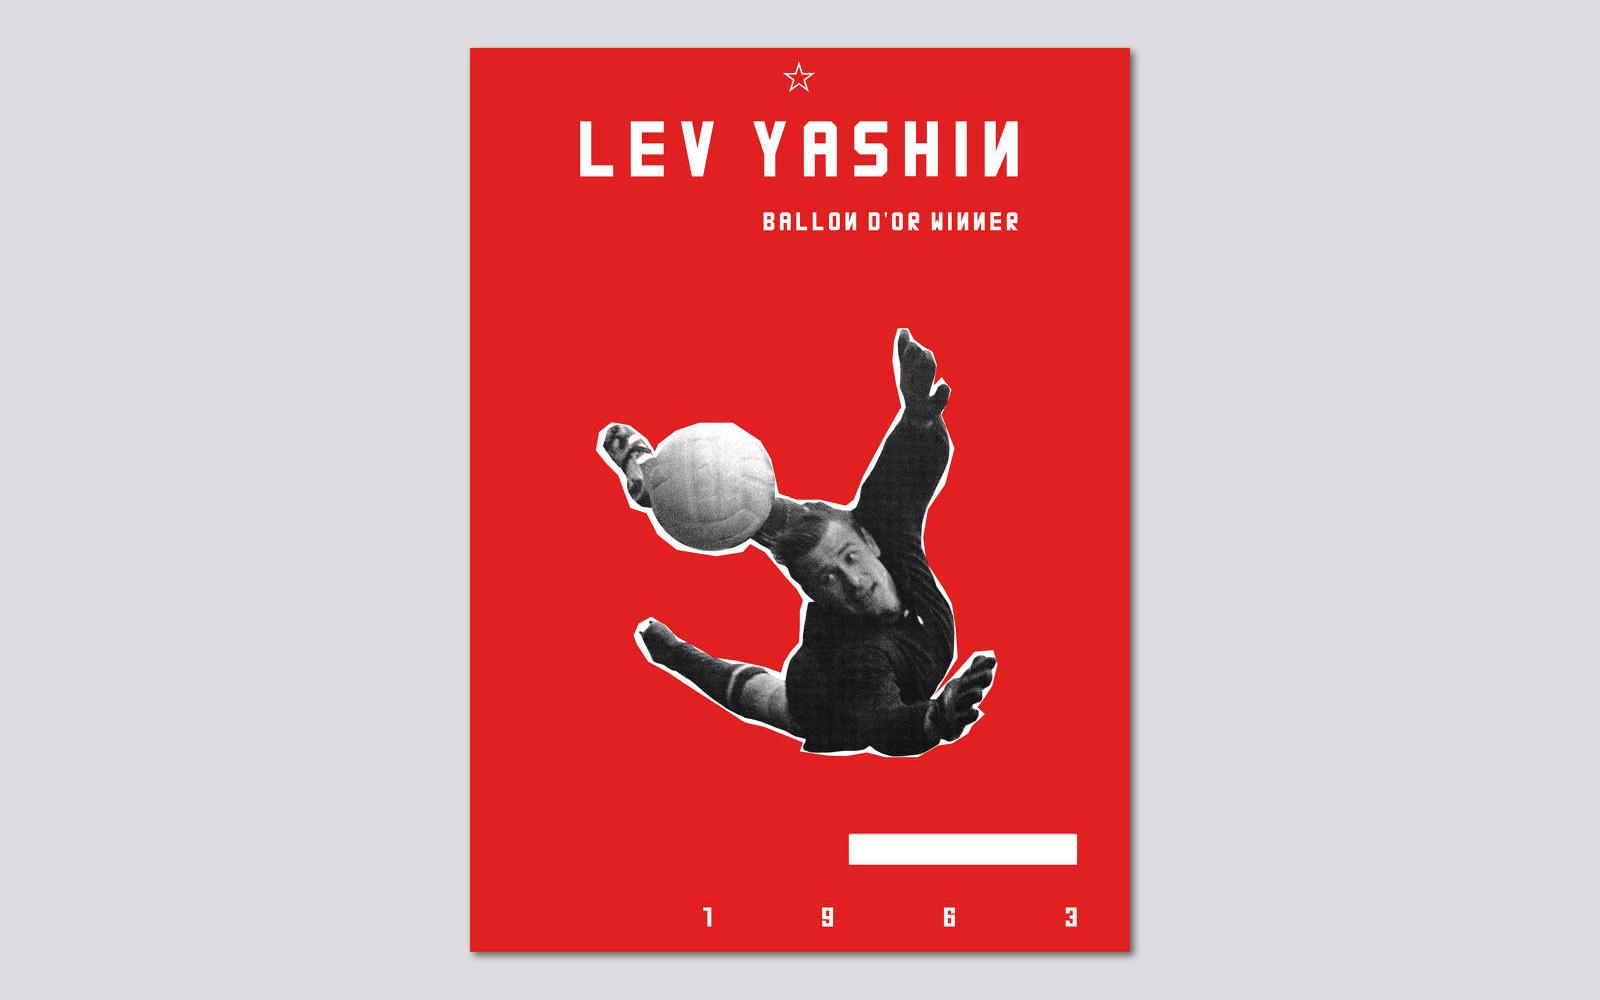 yashin_web_new_1600_c